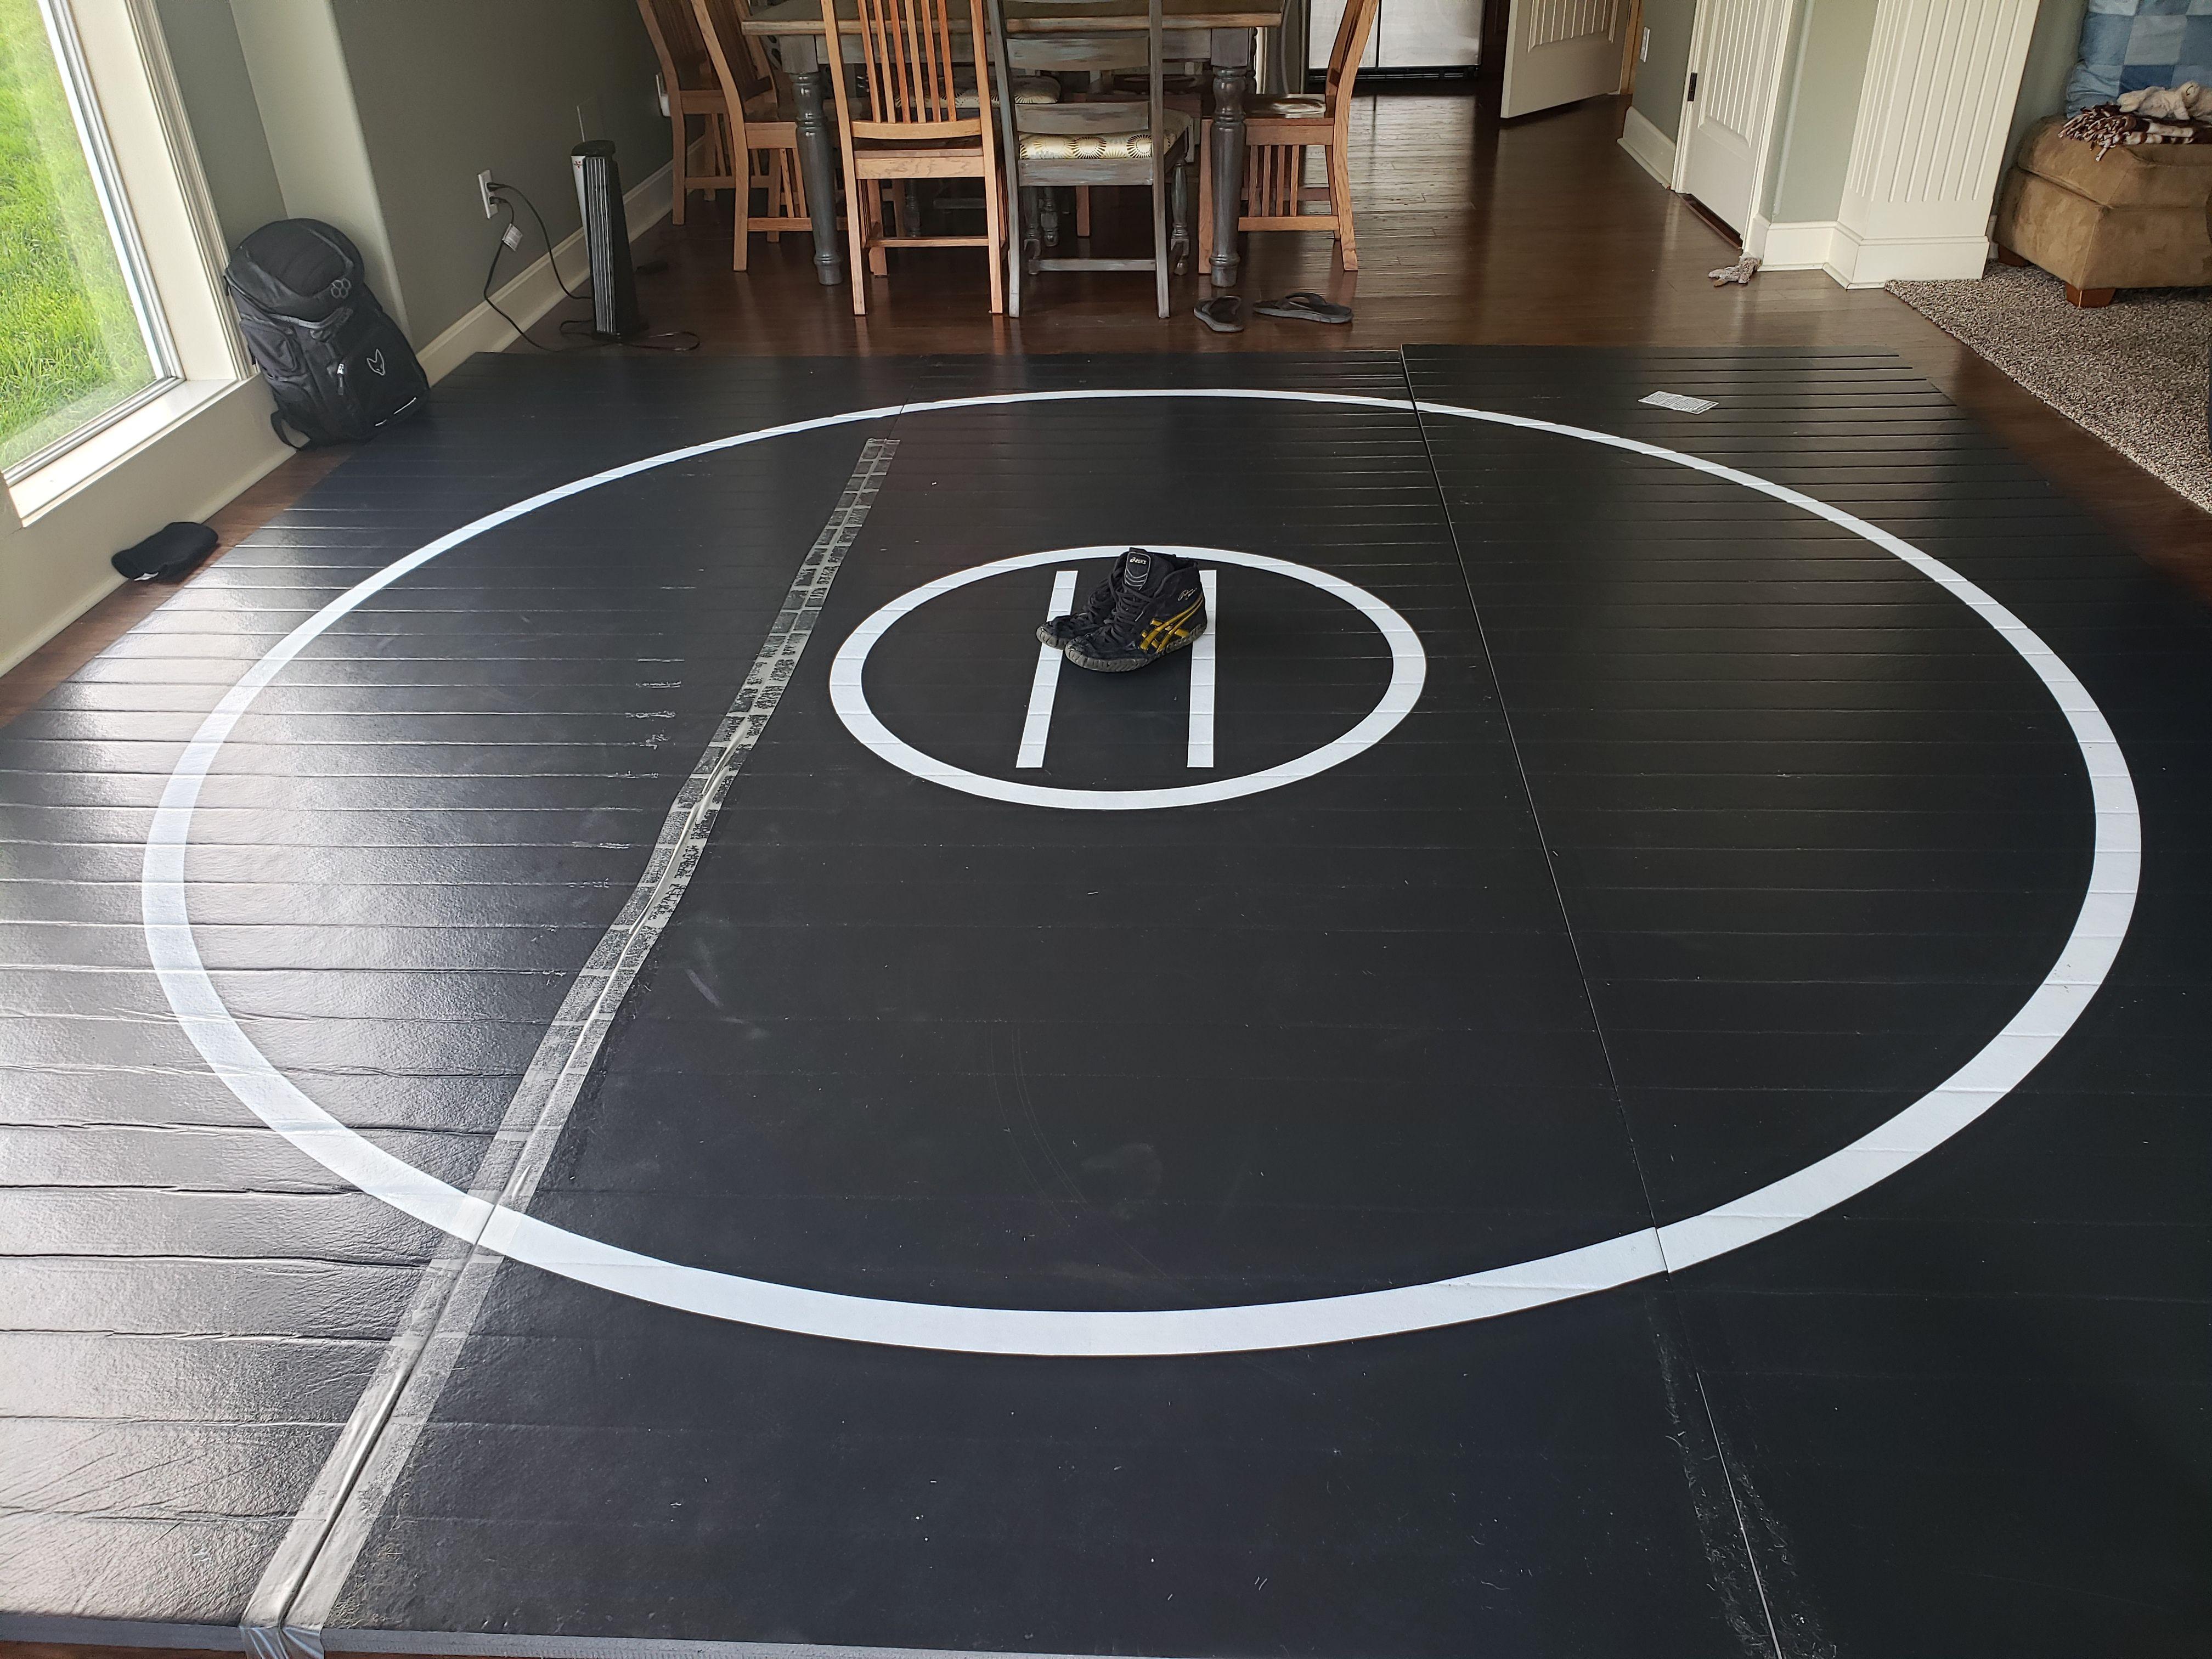 12 X 12 X 1 3 8 Roll Up Wrestling Mat In 2020 Wrestling Mat Wrestling Home